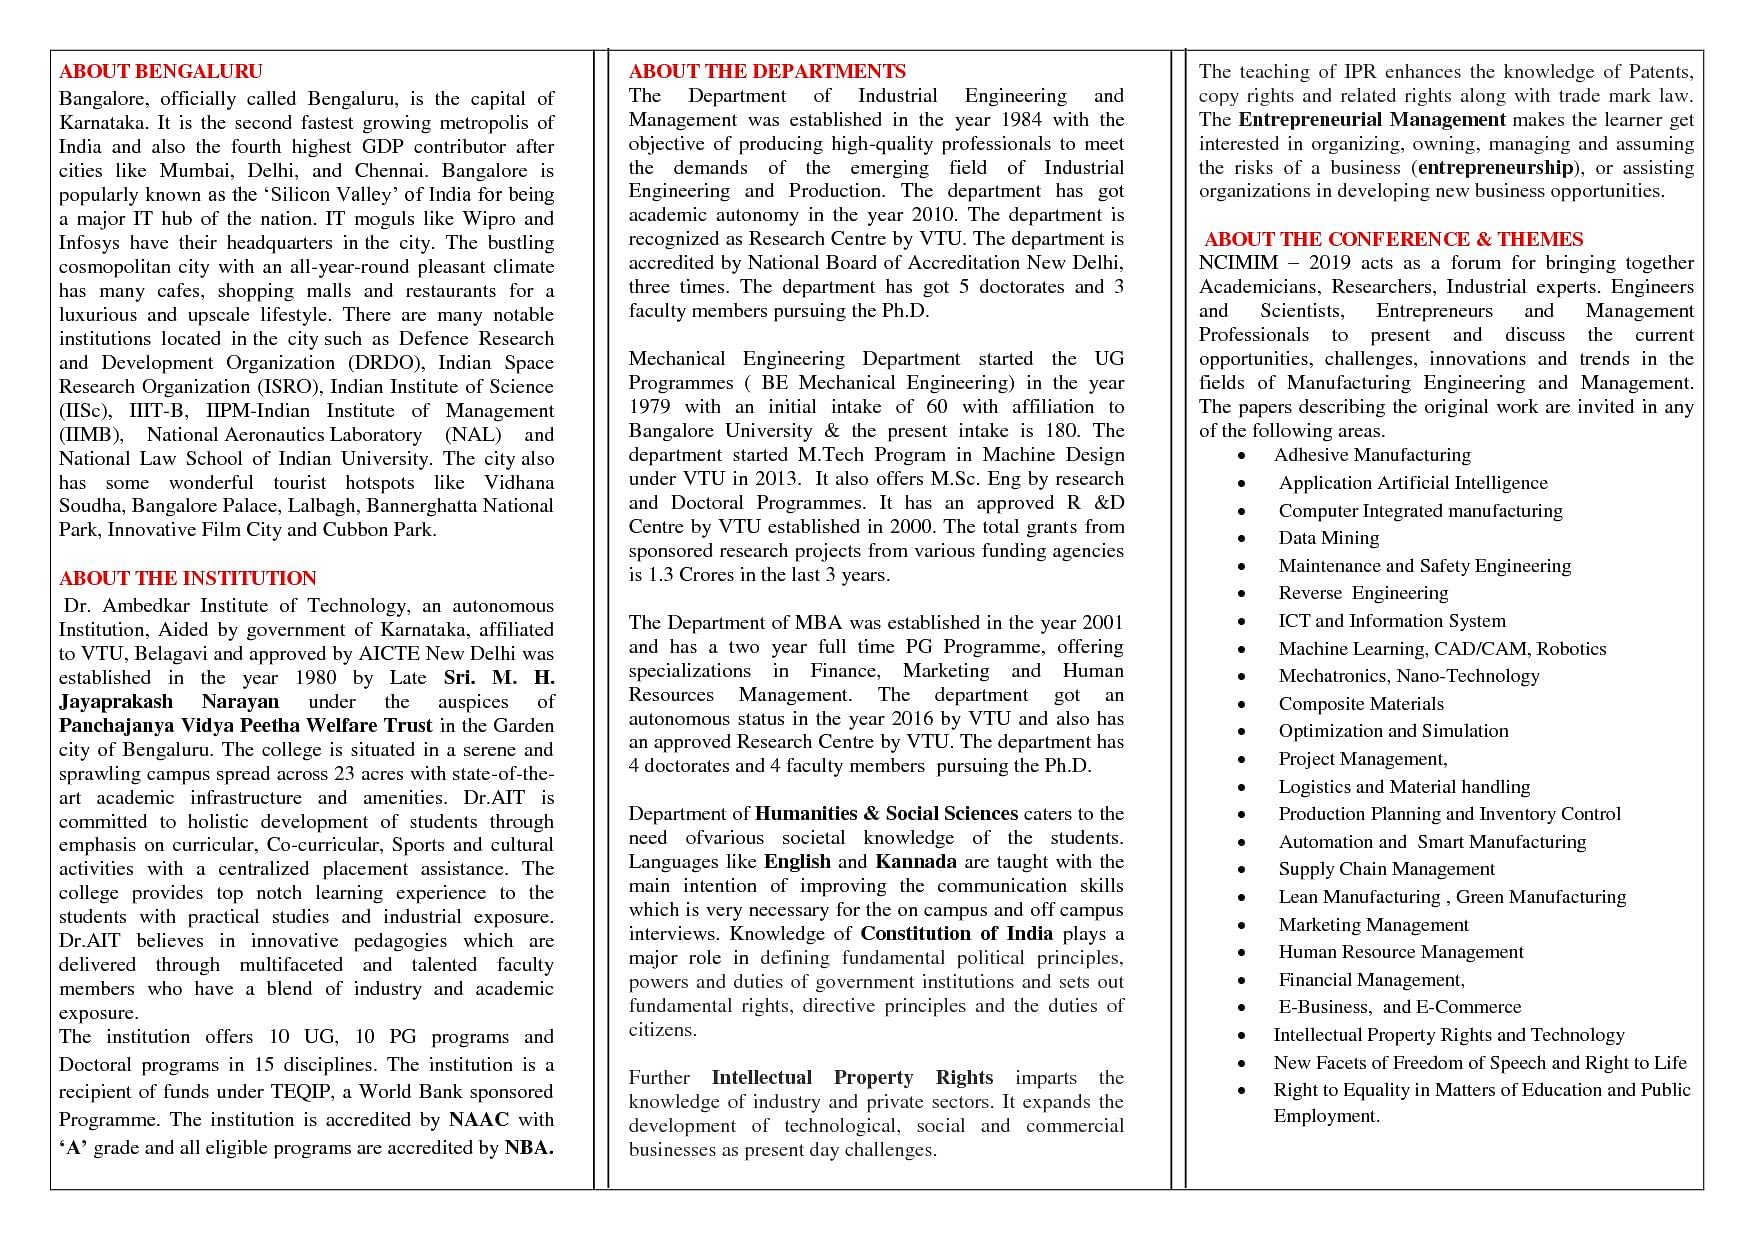 Dr Ambedkar Institute of Technology, Banaglore - Cutoff 2019